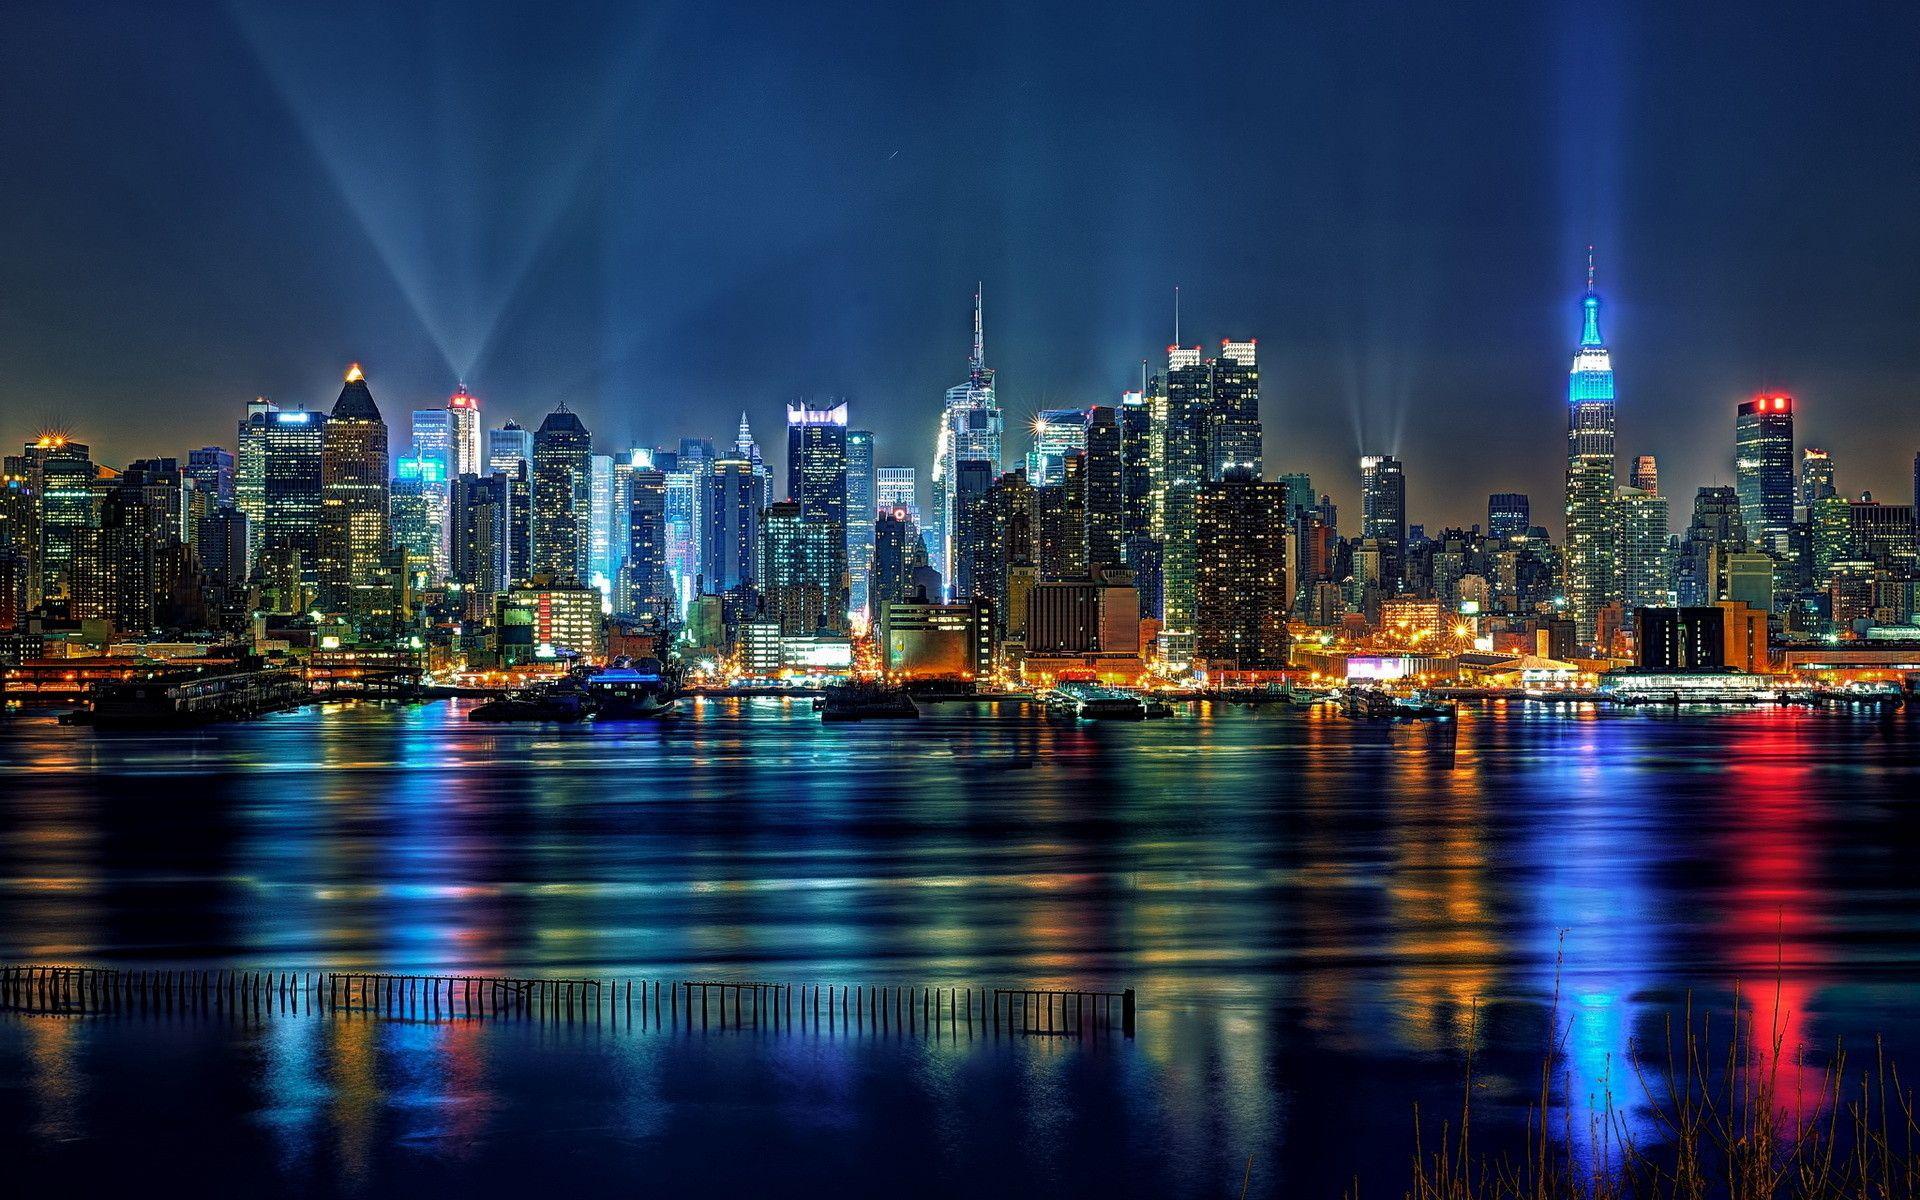 Hd Place Wallpapers City Views Amazing Desktop Images 4k